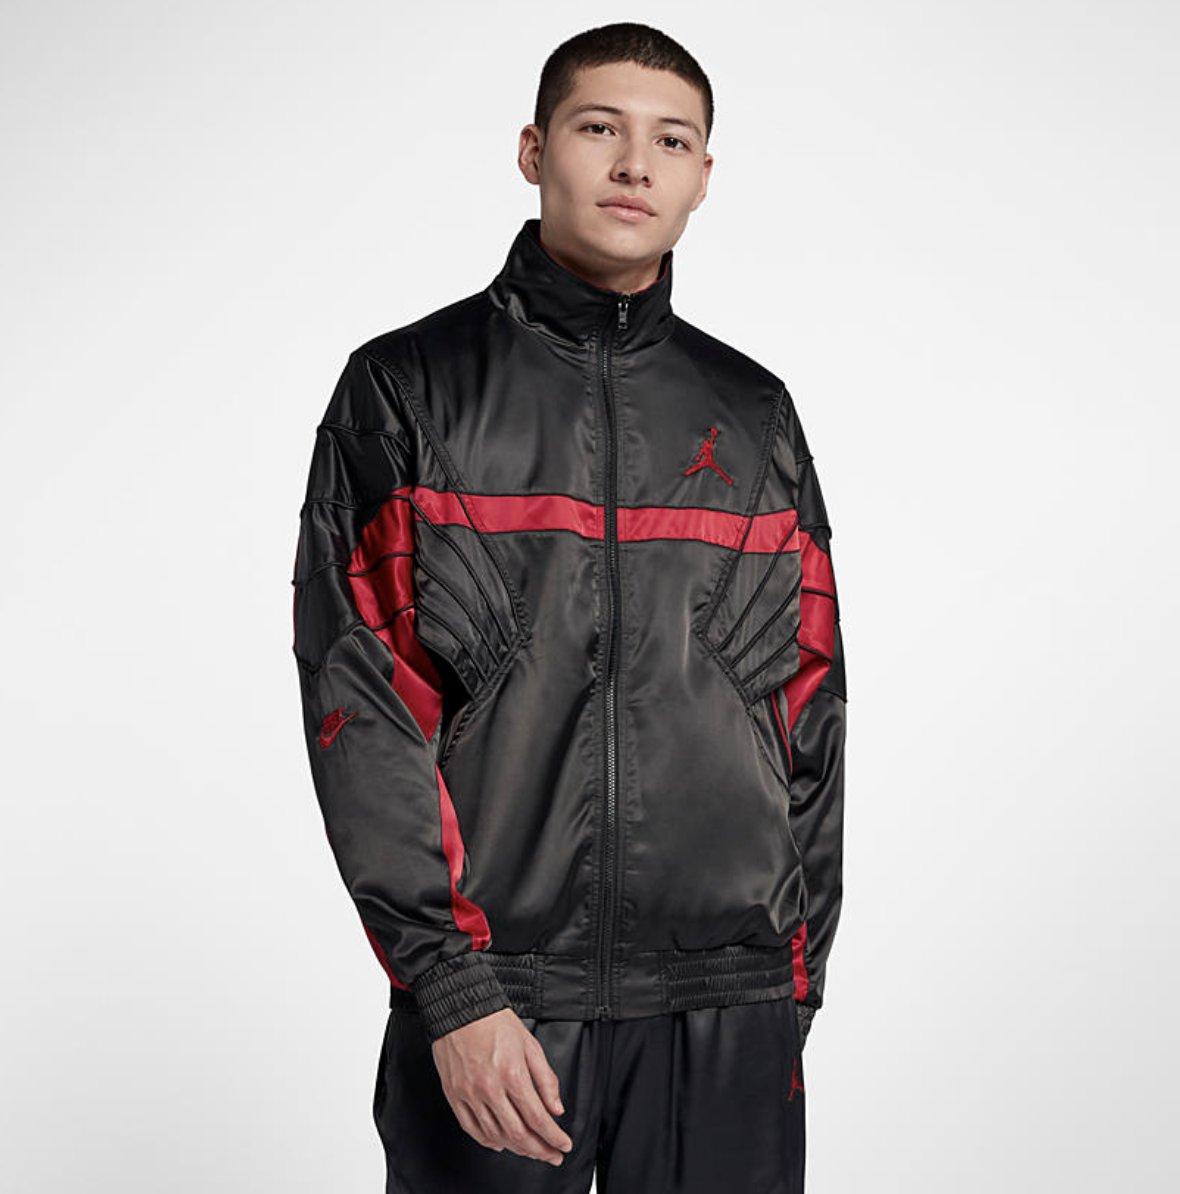 34d96d986325 Jordan Sportswear AJ5  Satin  Jacket dropped via Nike US     http   bit.ly 2urMETc pic.twitter.com qB3sB8eemv